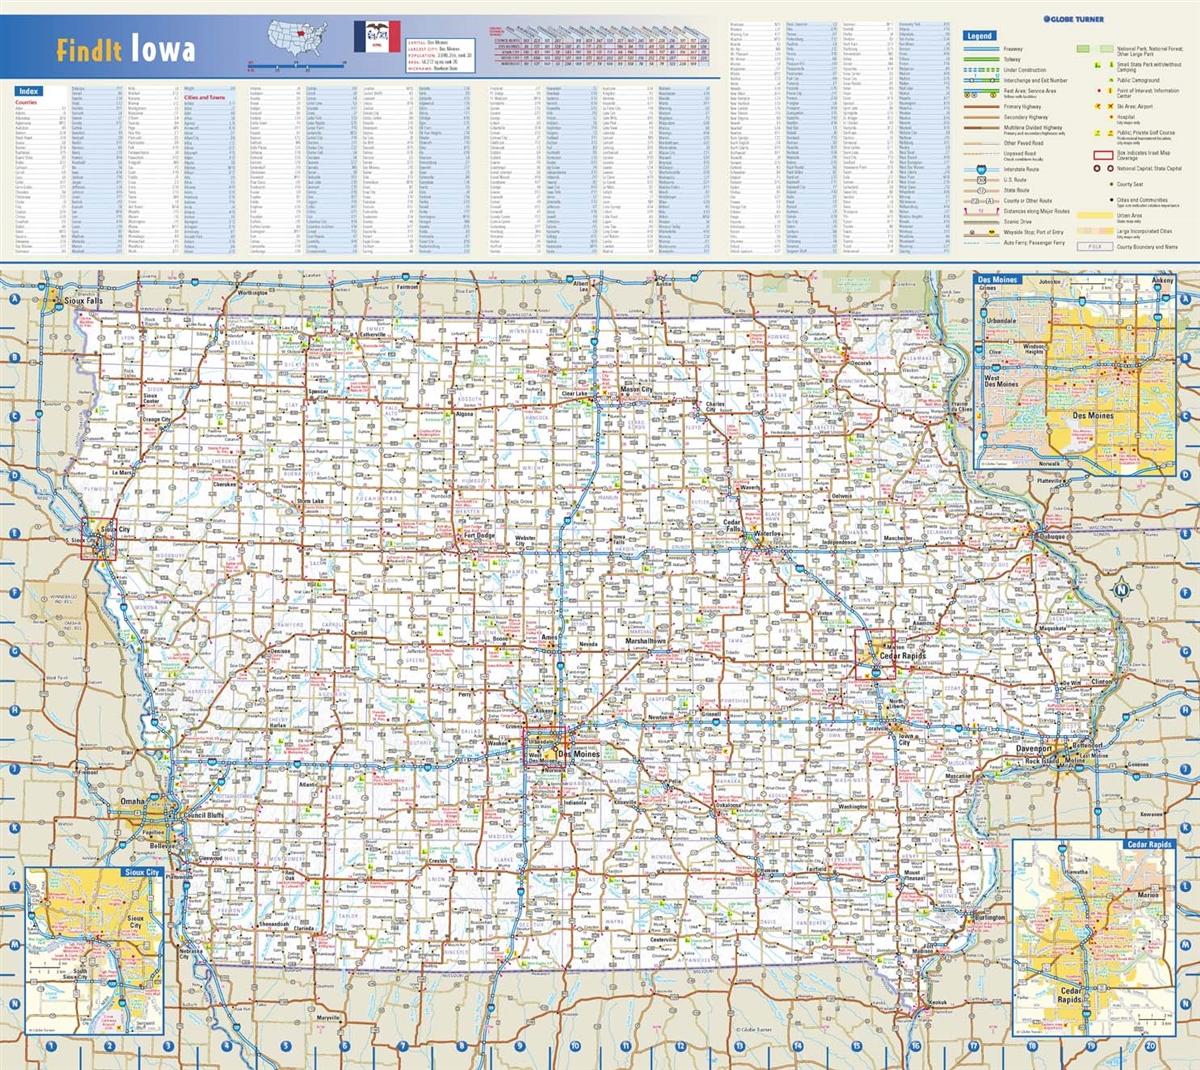 Iowa State Wall Map by Globe Turner 21 x 19 on map counties in iowa, map rivers in iowa, map state parks in iowa,